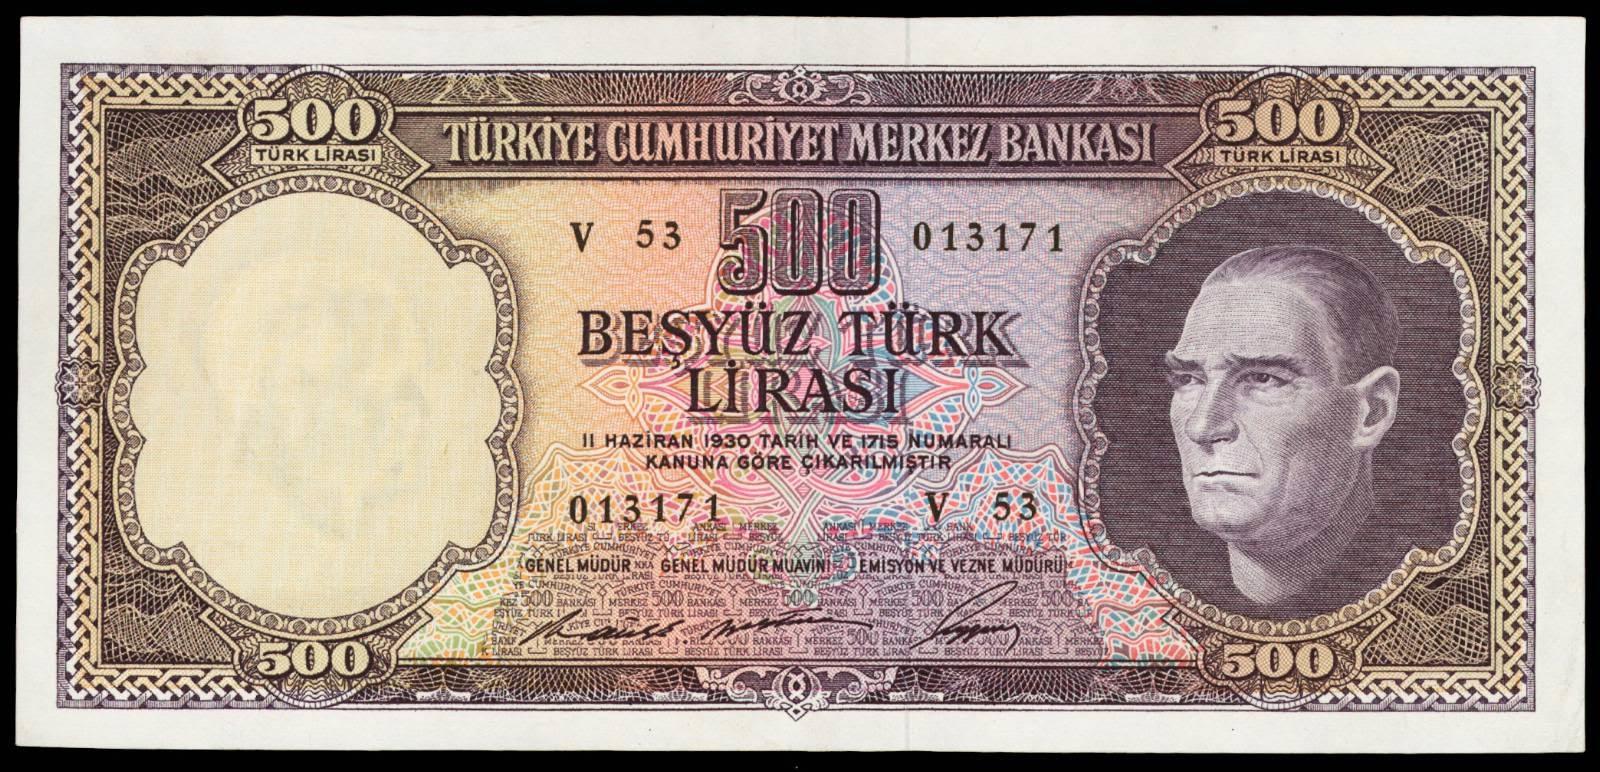 Turkey banknotes 500 Turkish Lira banknote 1962 Atatürk